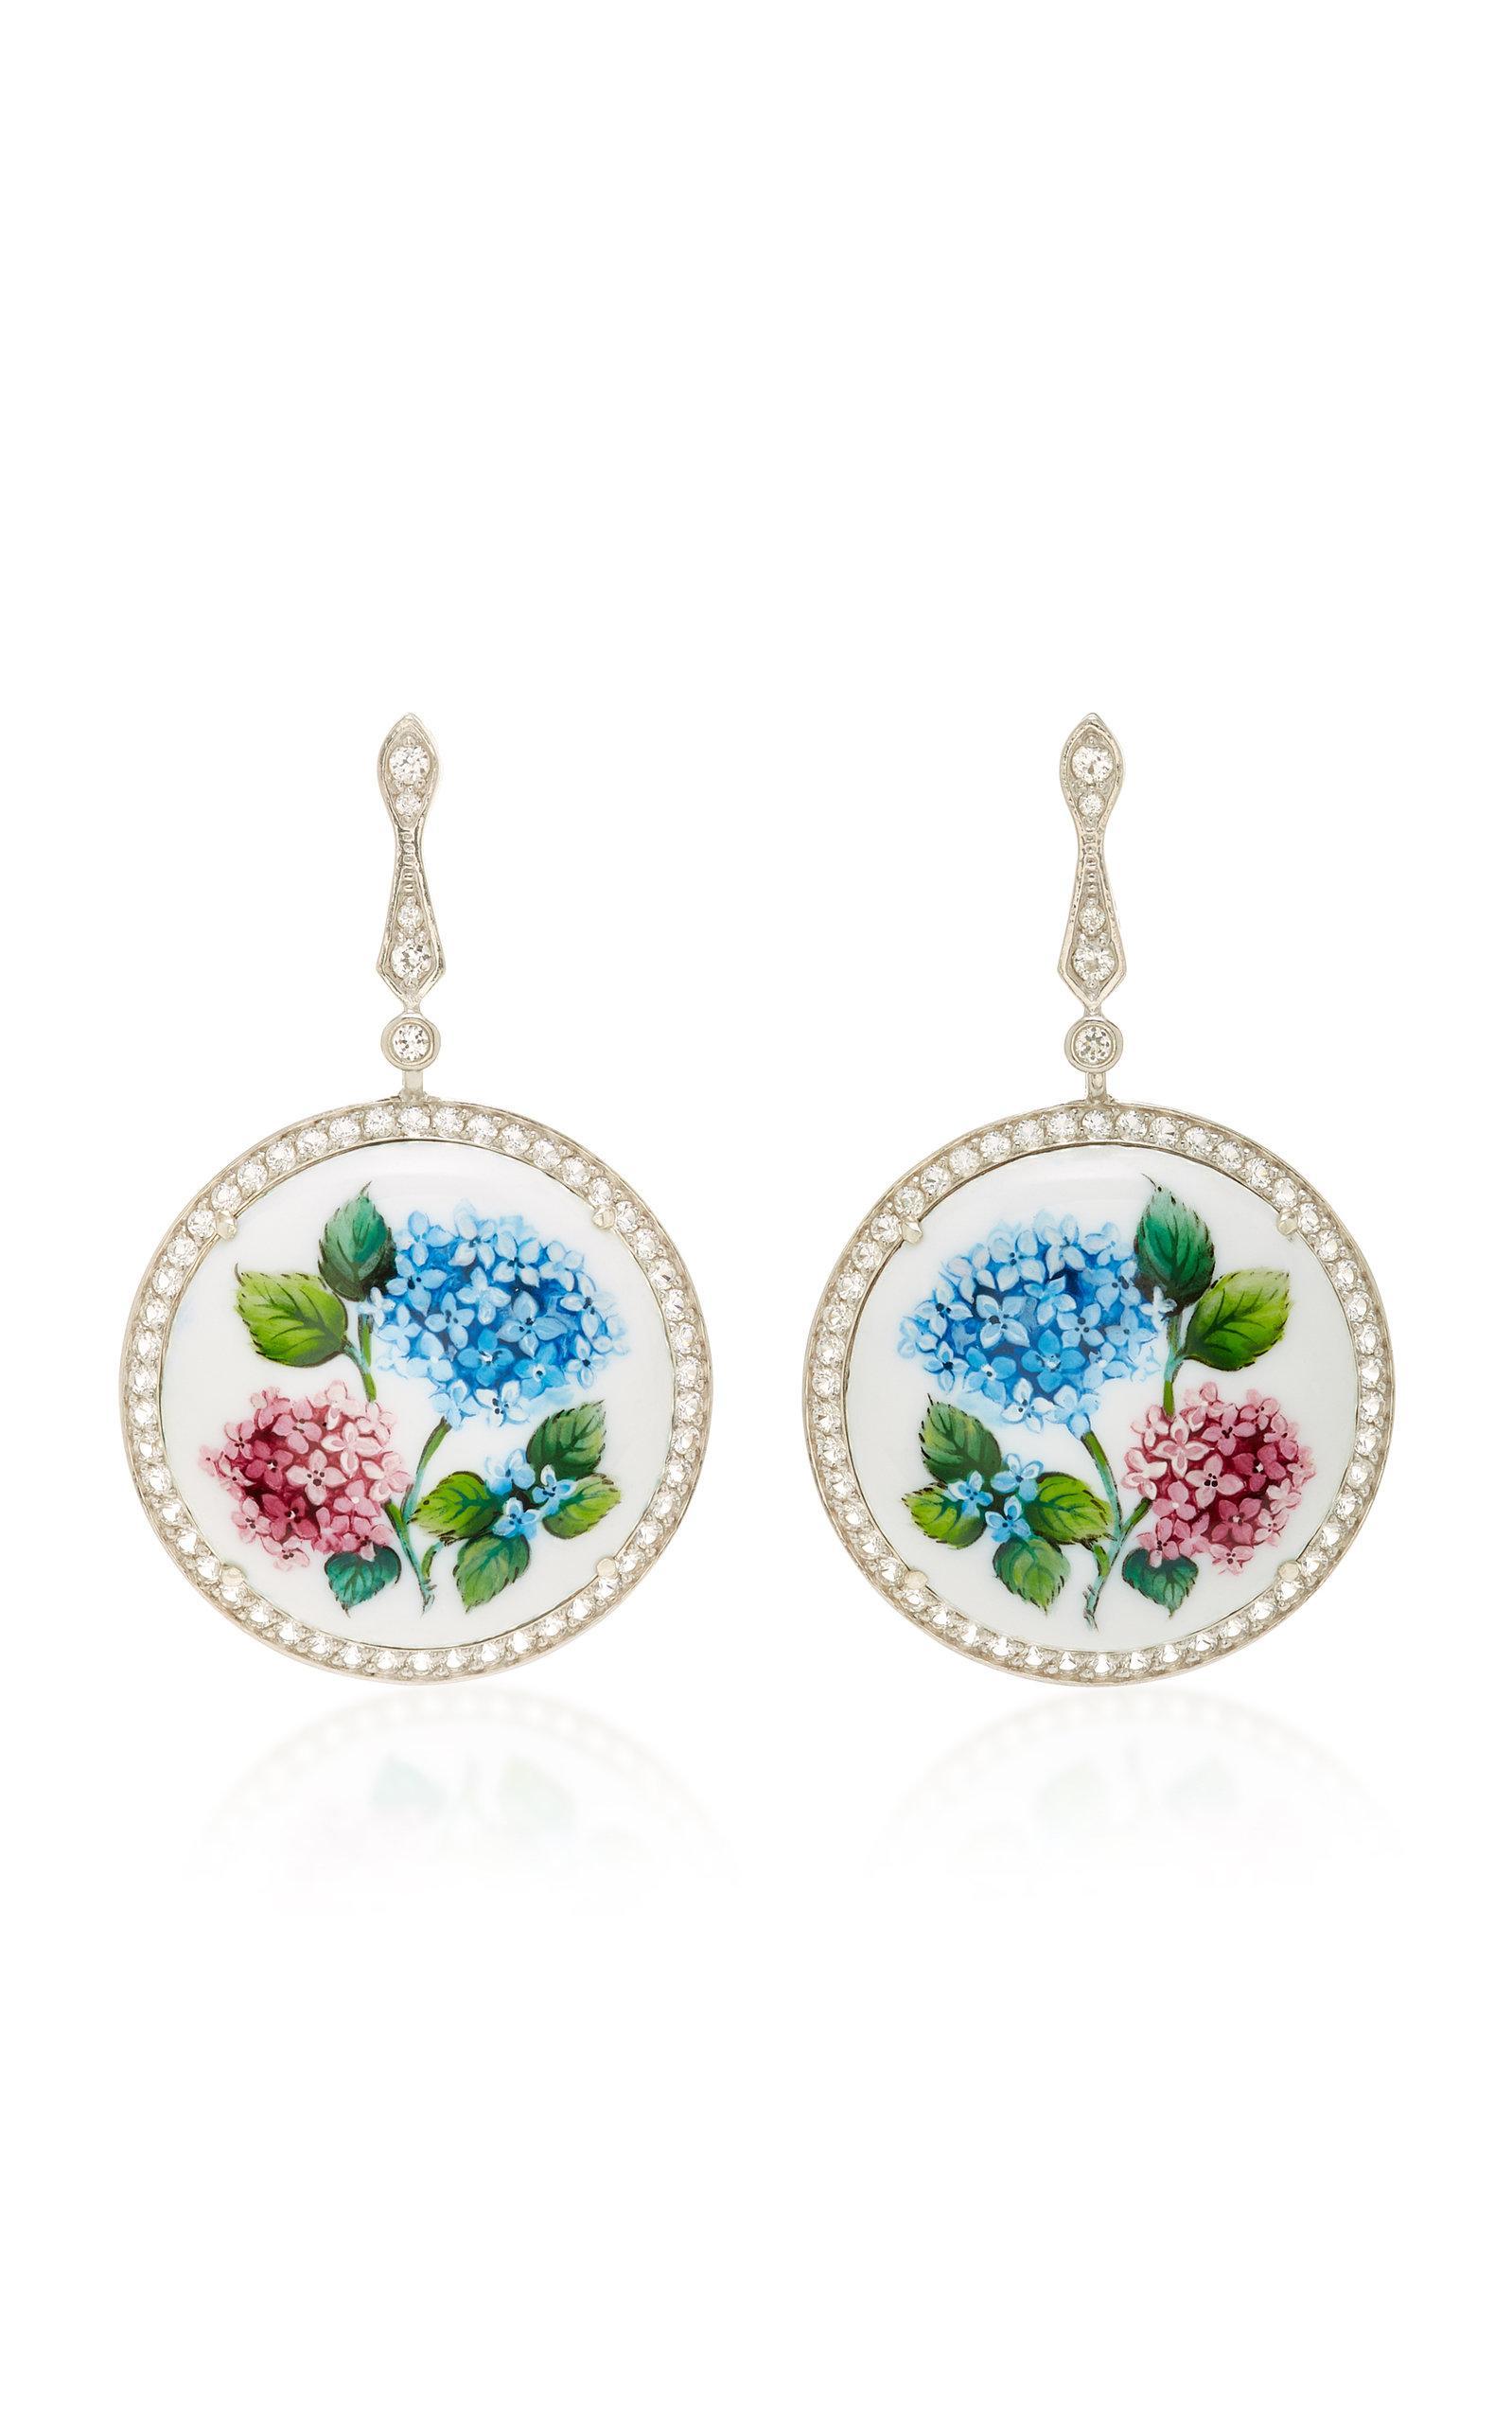 Axenoff Jewellery Flower Addiction Silver Drop Earrings In Floral